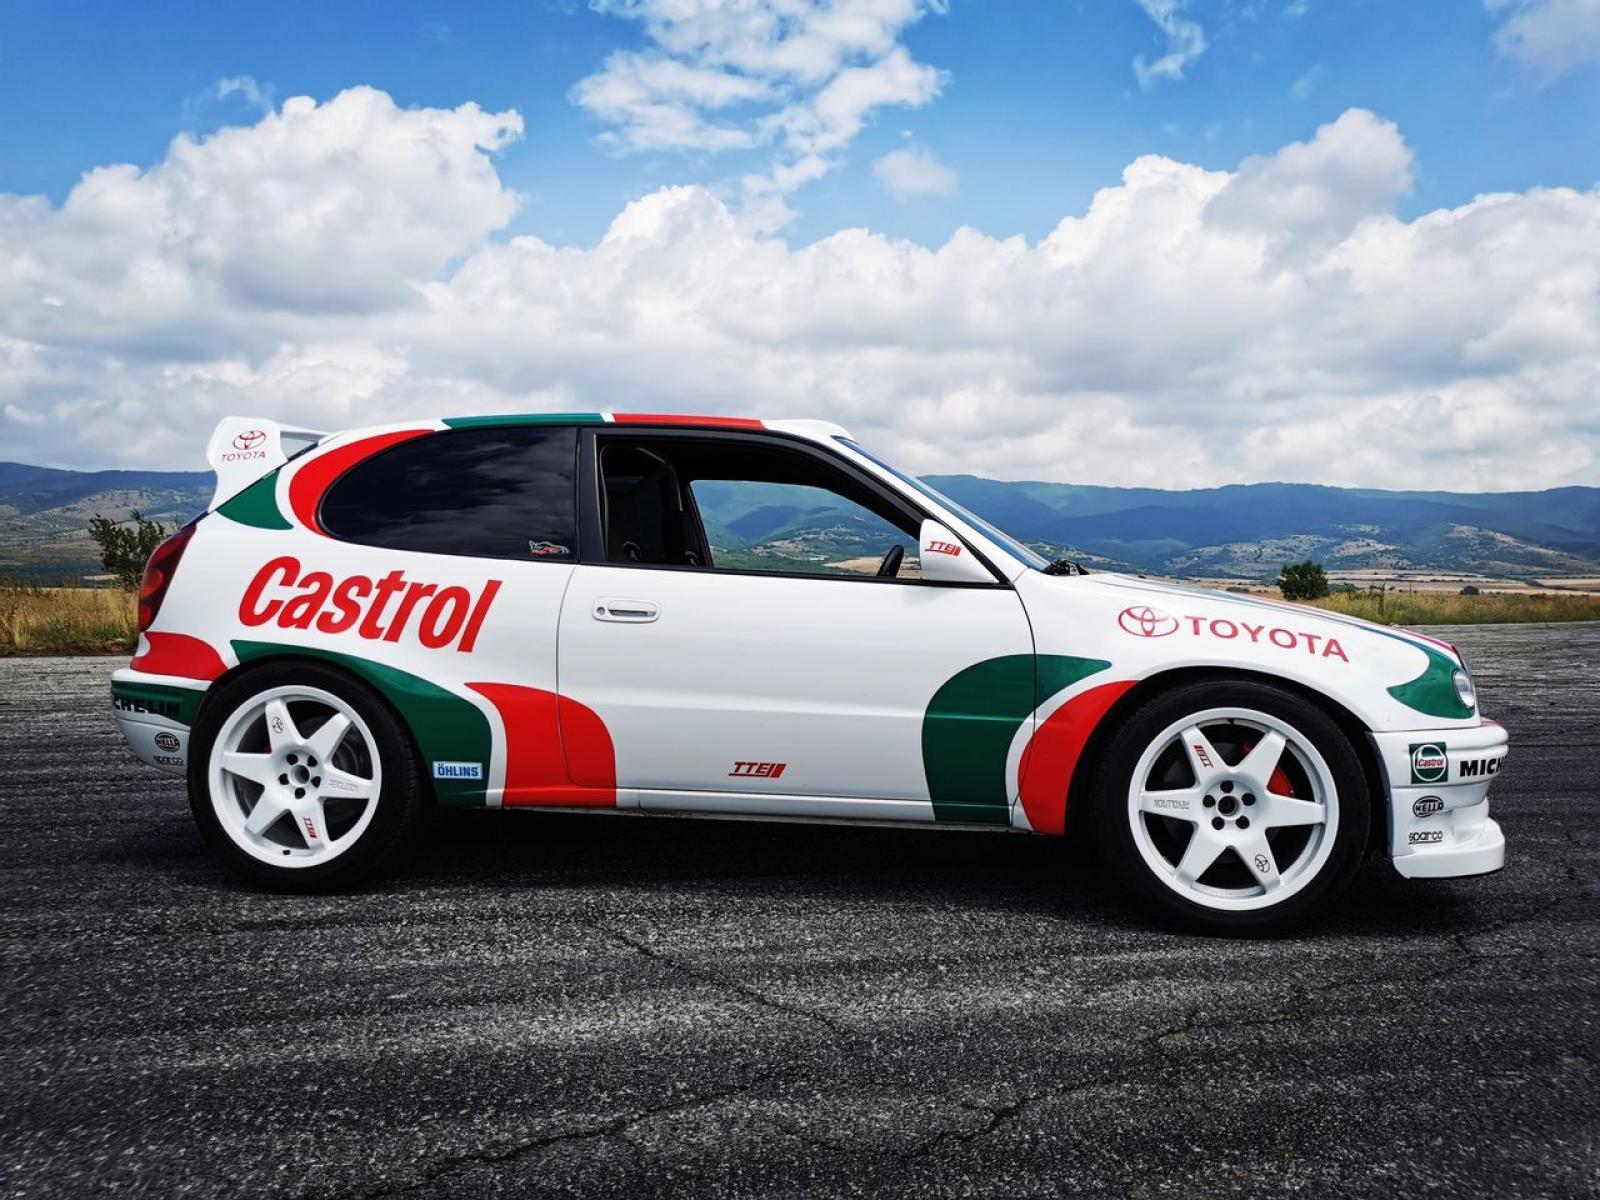 TOYOTA Corolla WRC Replica - 2